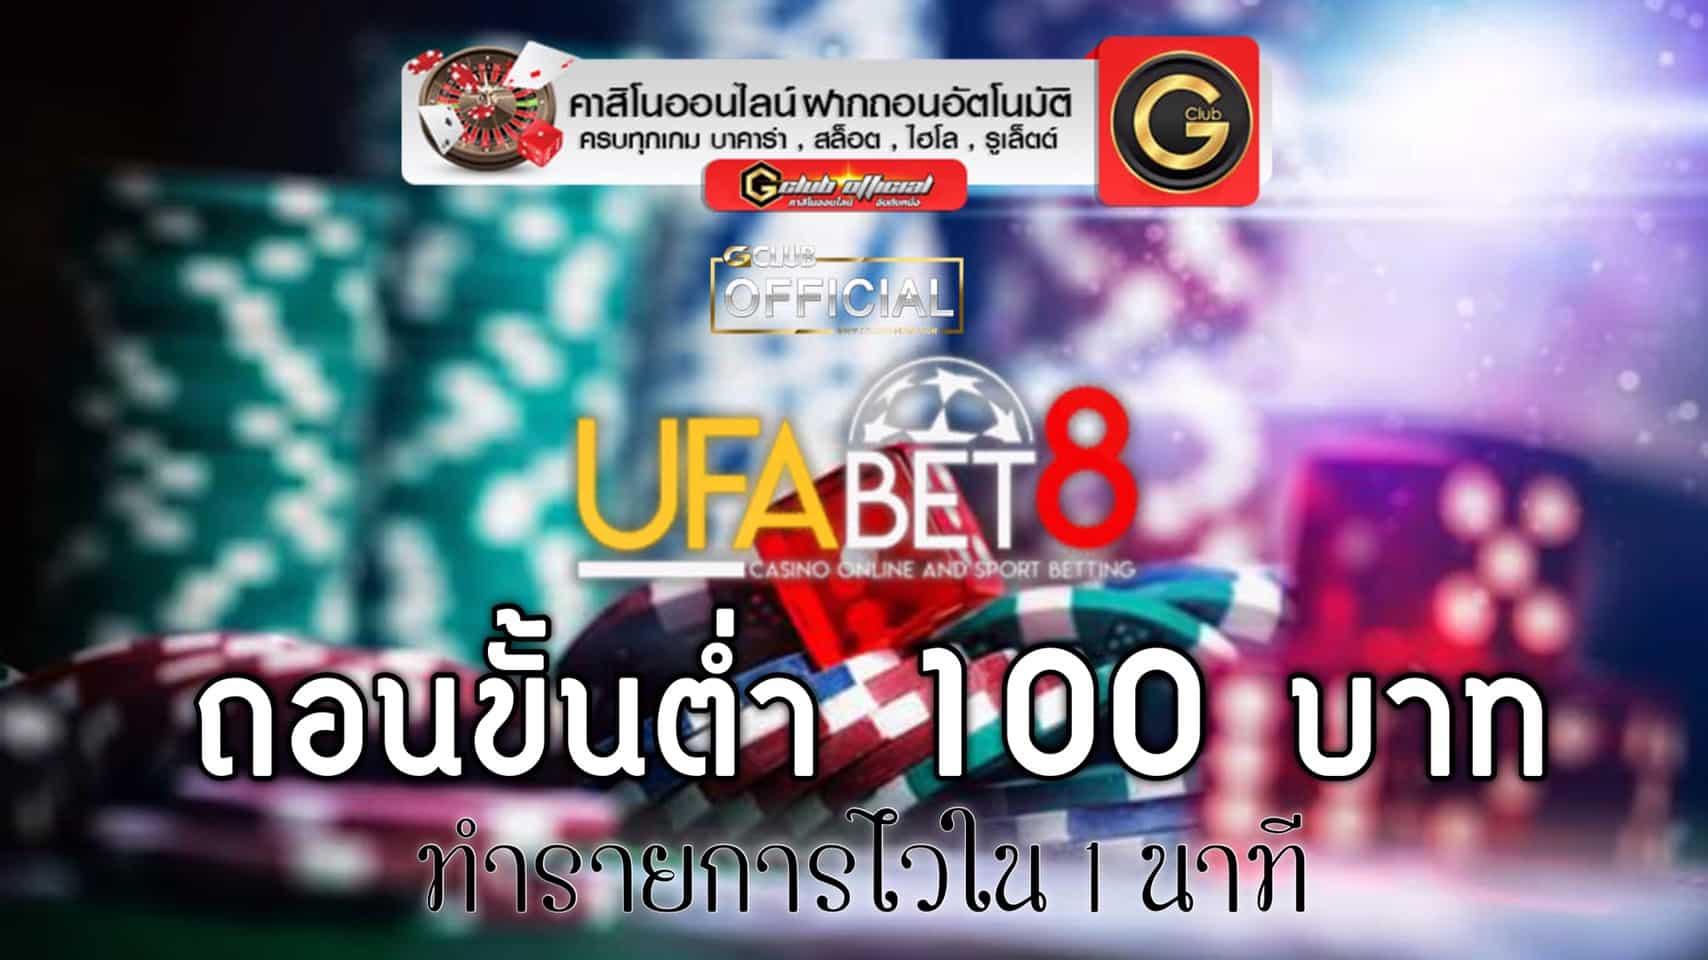 ufabet8 ถอนขั้นต่ำ 100 บาท